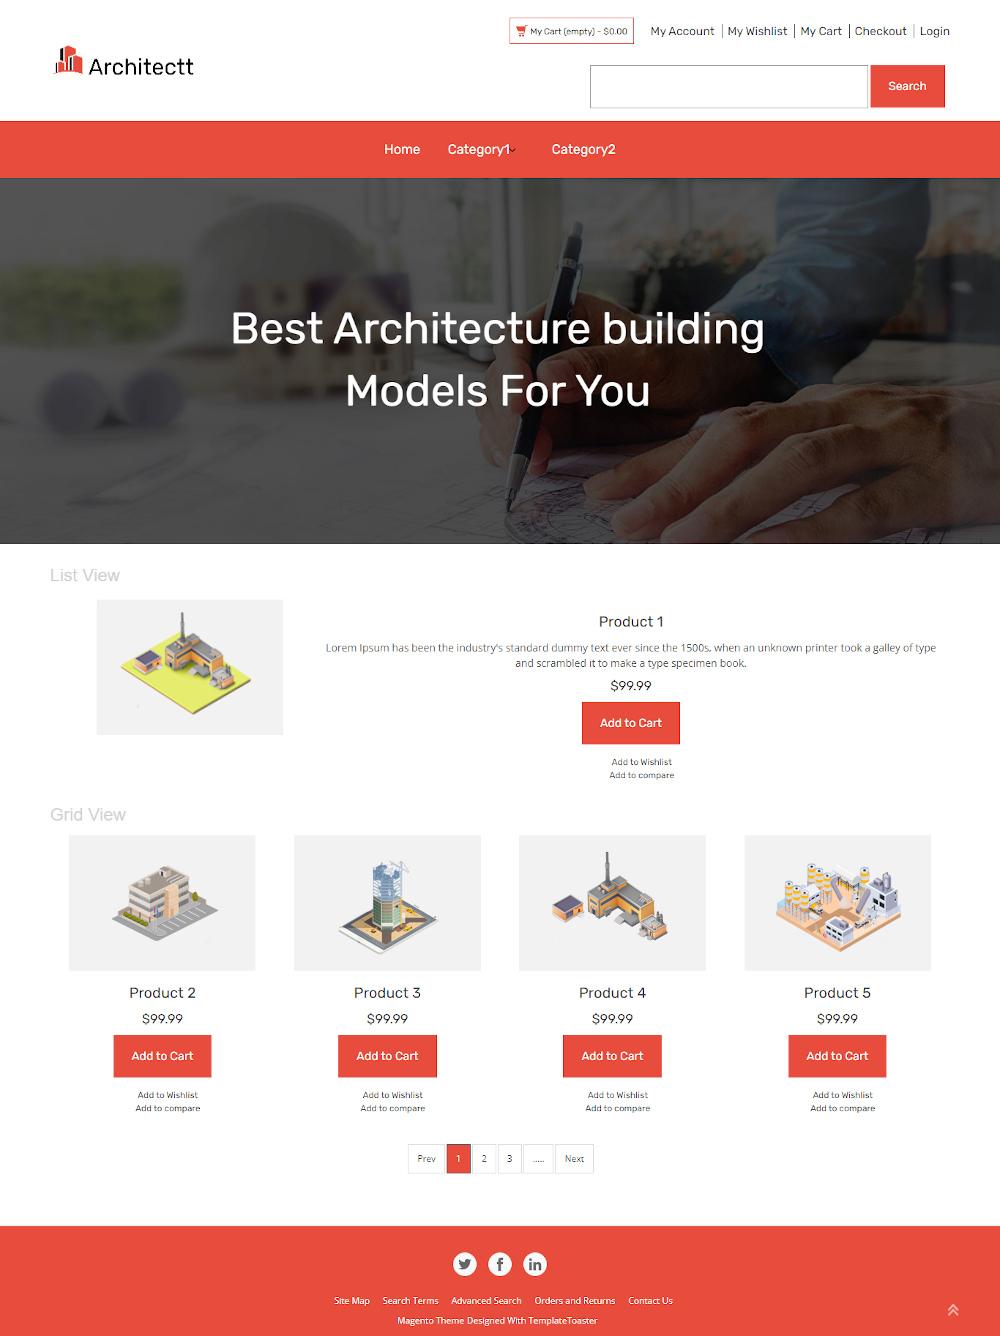 Architectt - Online Architecture Building Model Store Magento Theme